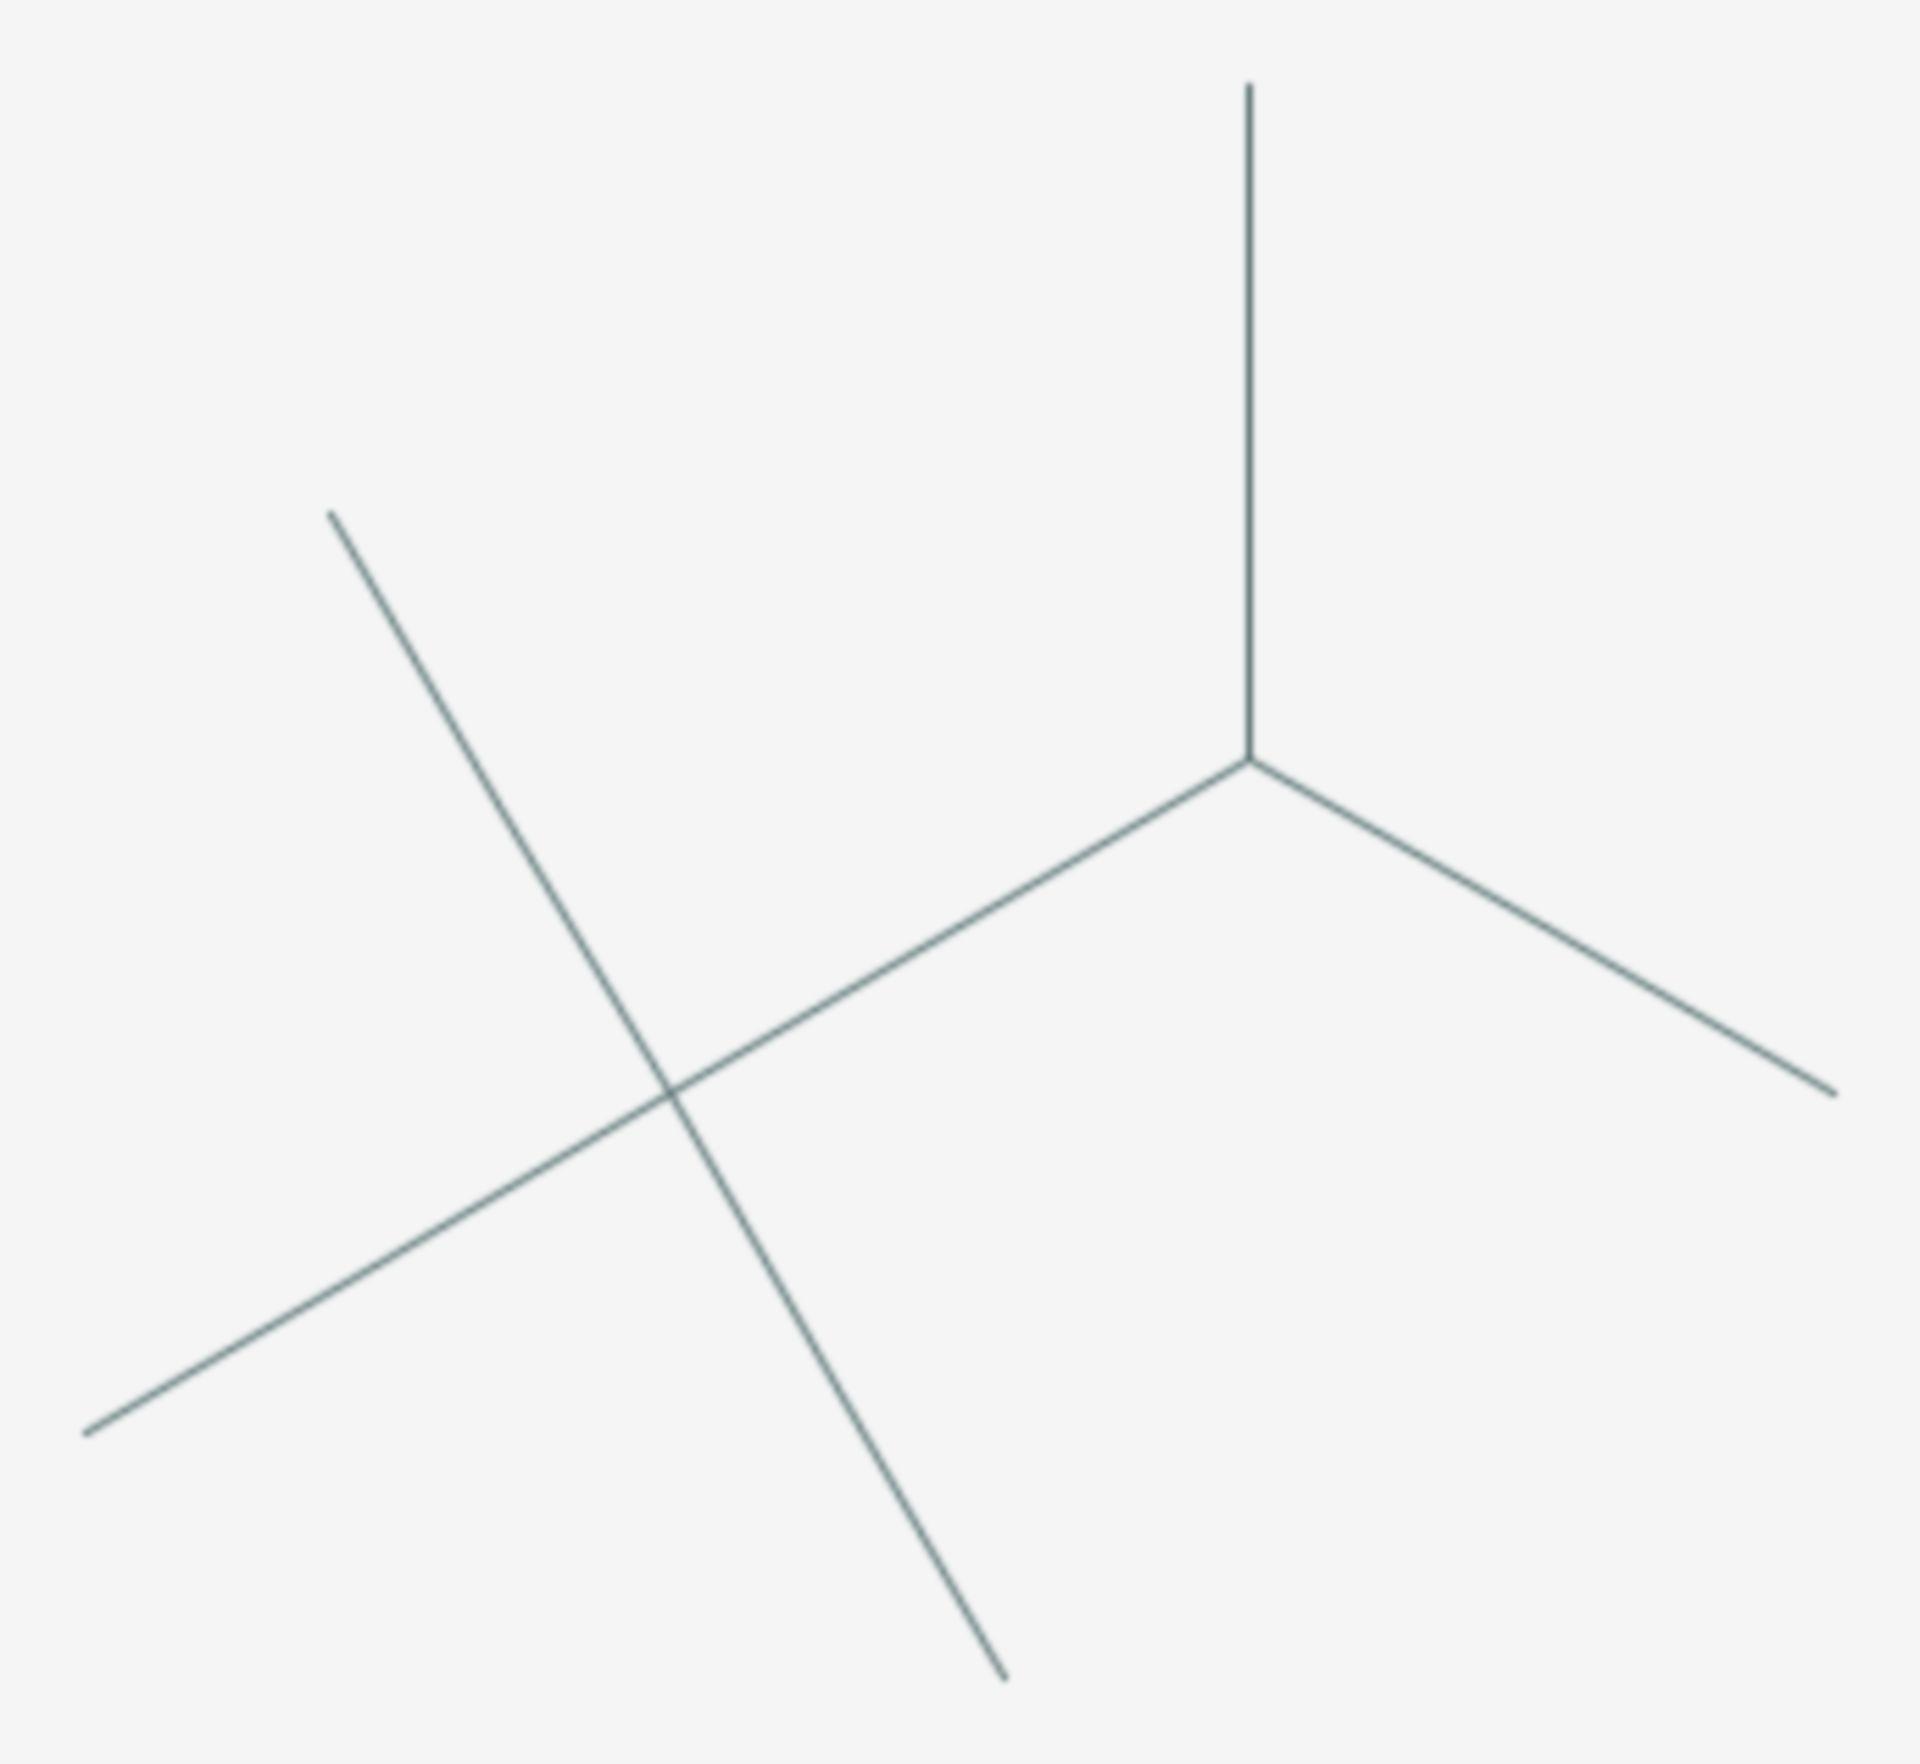 2,2,3-Trimethylbutan (Strukturformel)